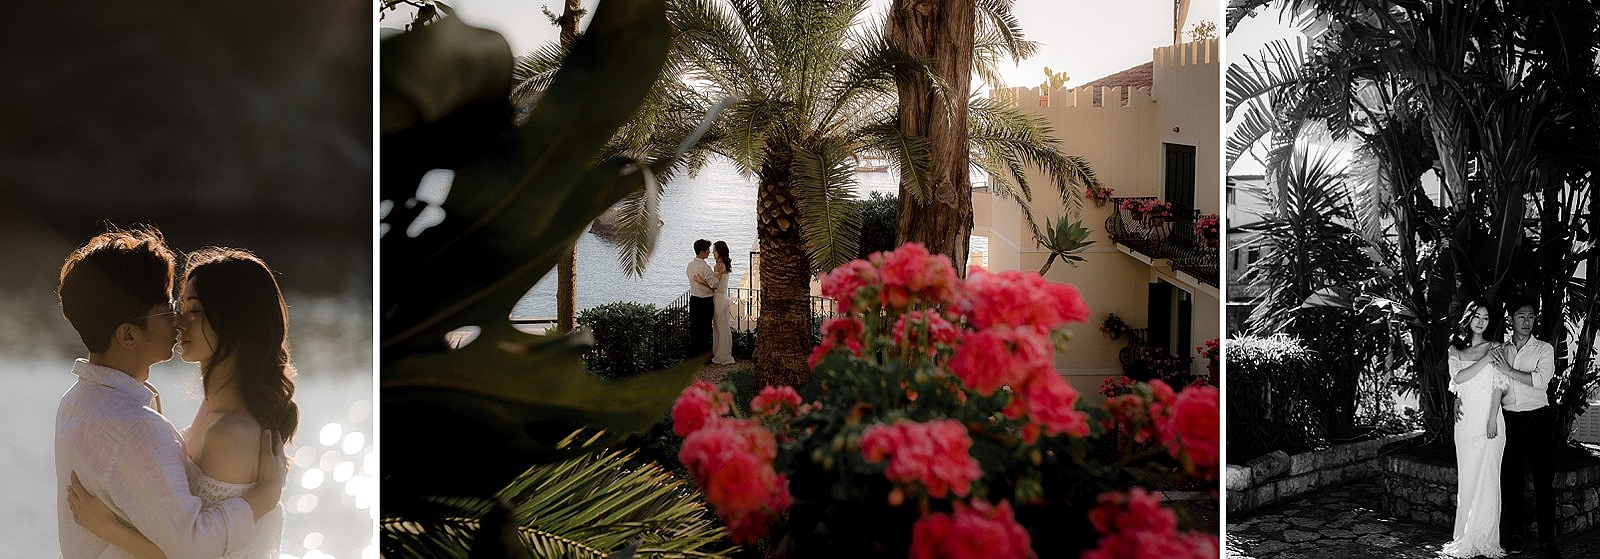 Fotomagoria Sicily Honeymoon of Korean couple 2.jpg